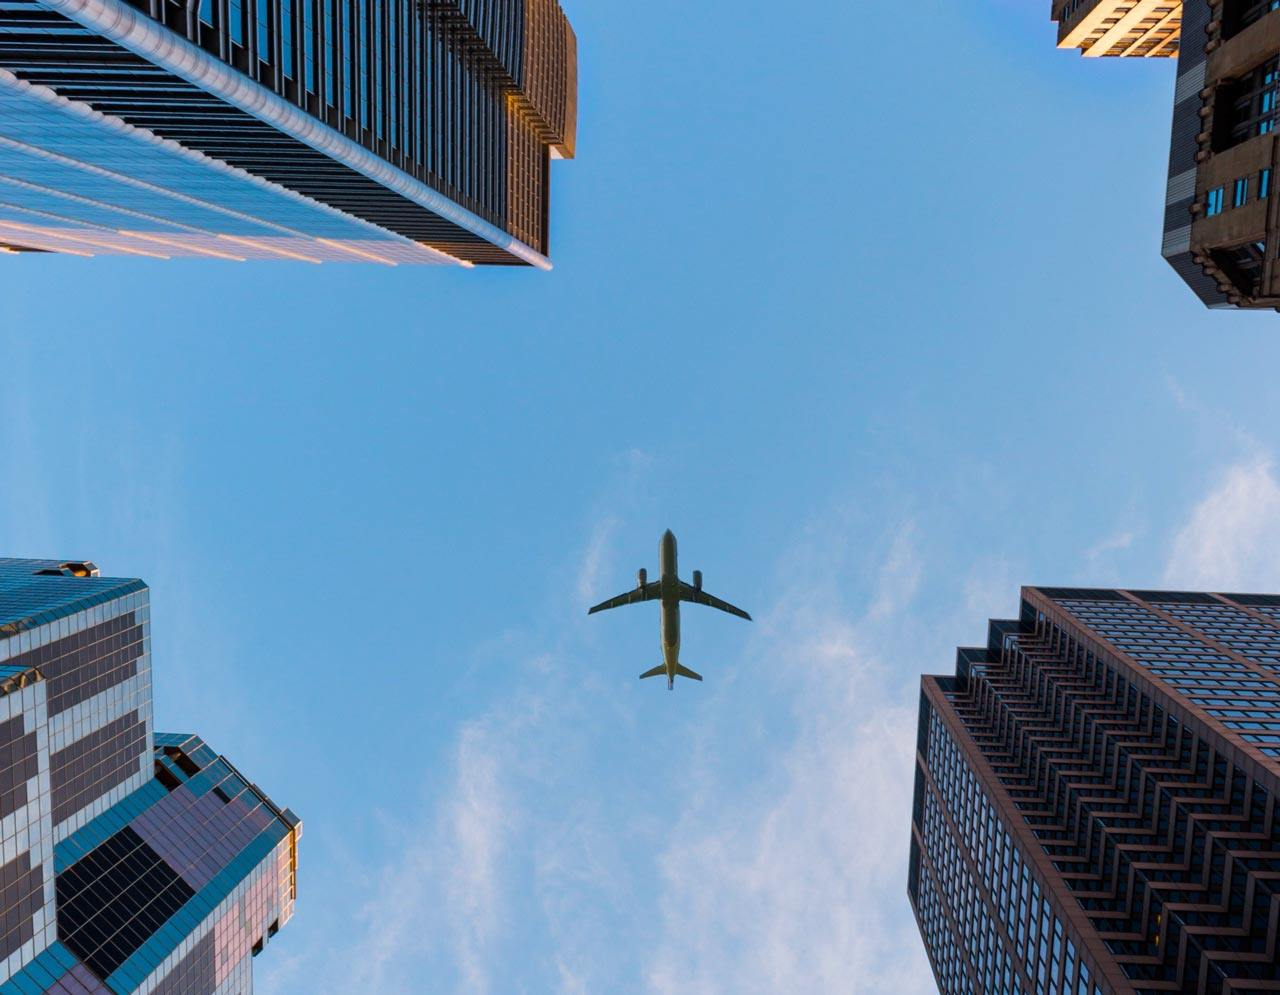 delocalisation roumanie avion